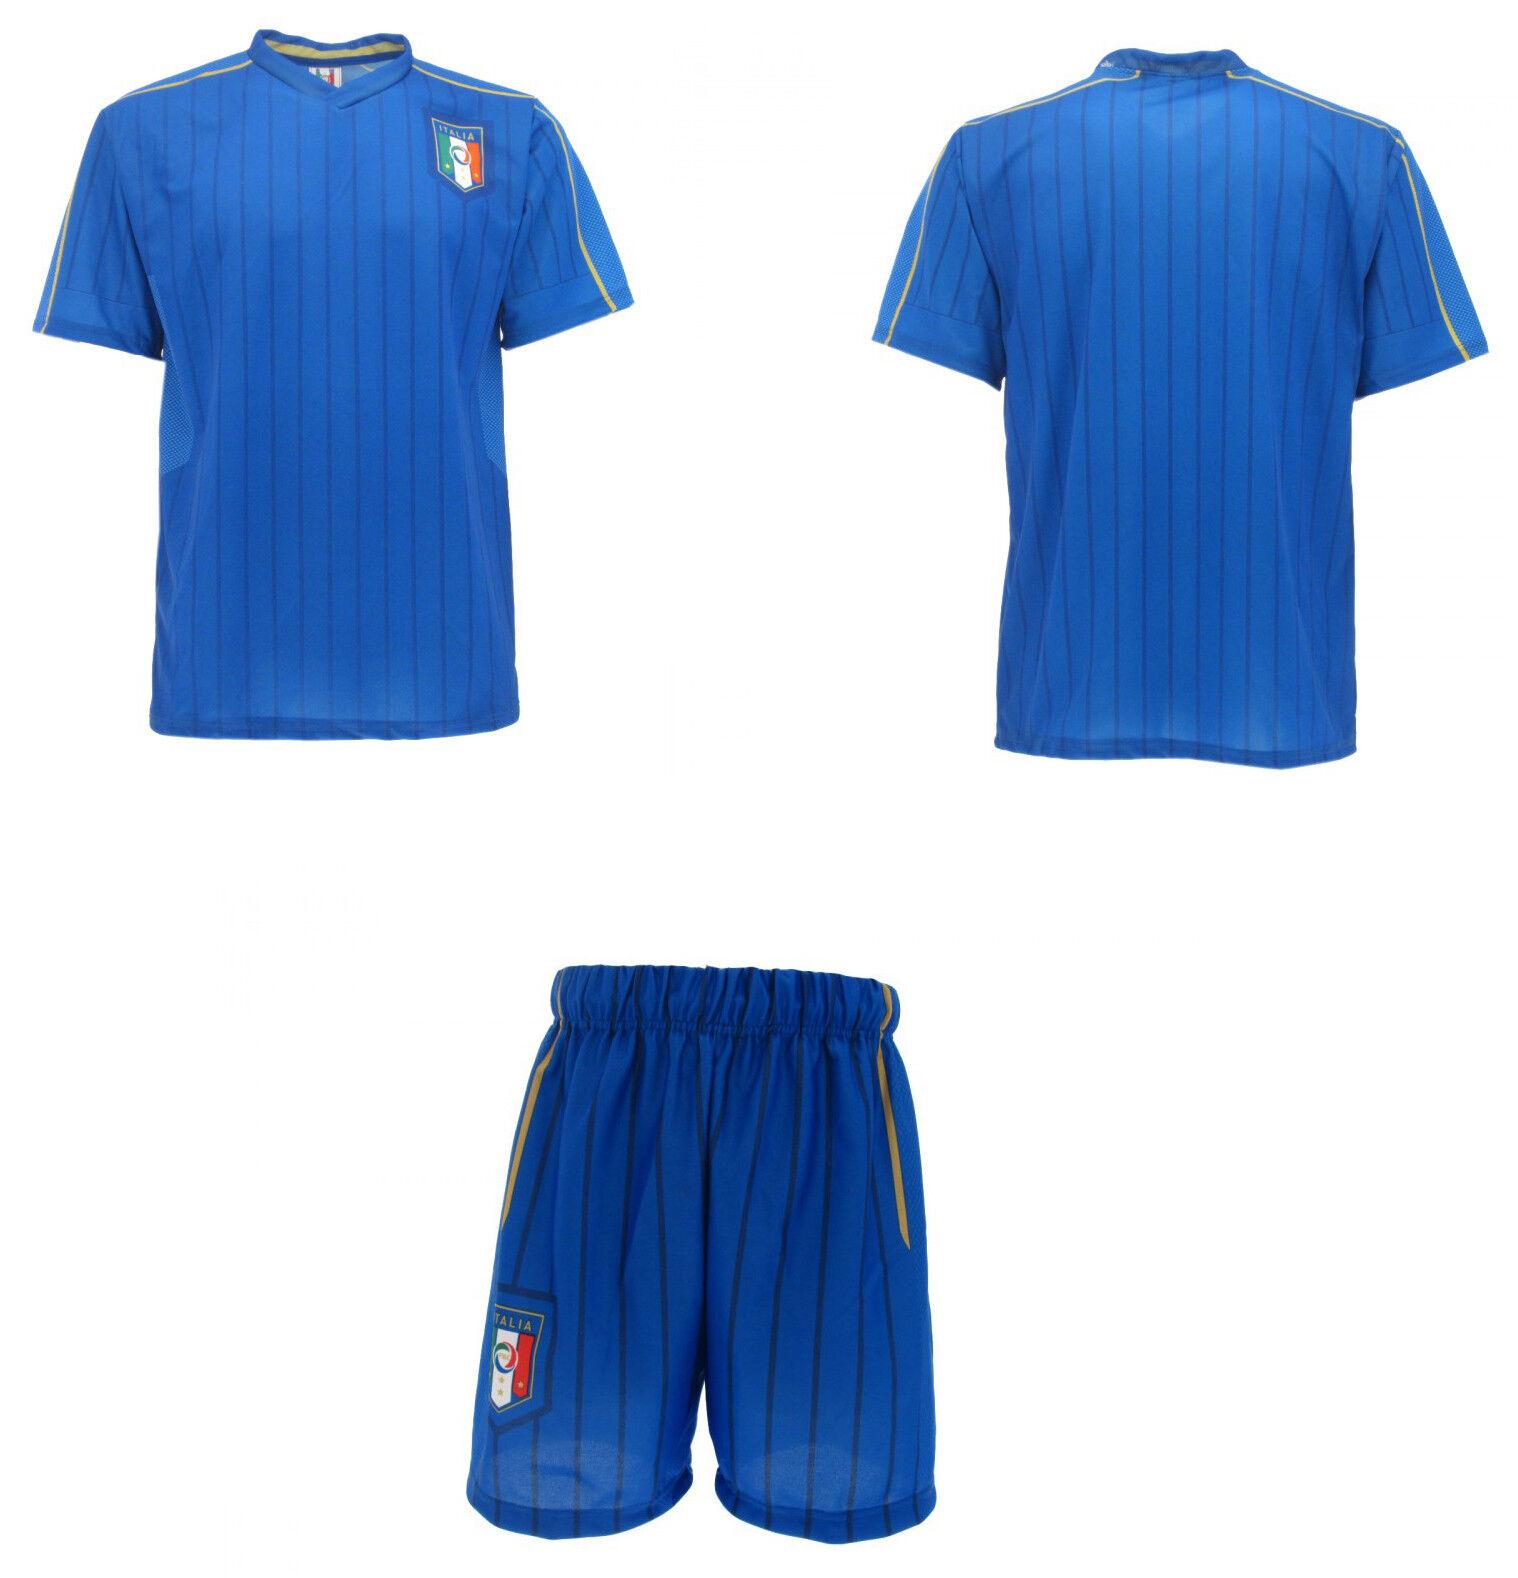 Set offizielle Italien national Trikot + Shorts Shorts Shorts FIGC neutra ohne Nome    Sofortige Lieferung  e8758e